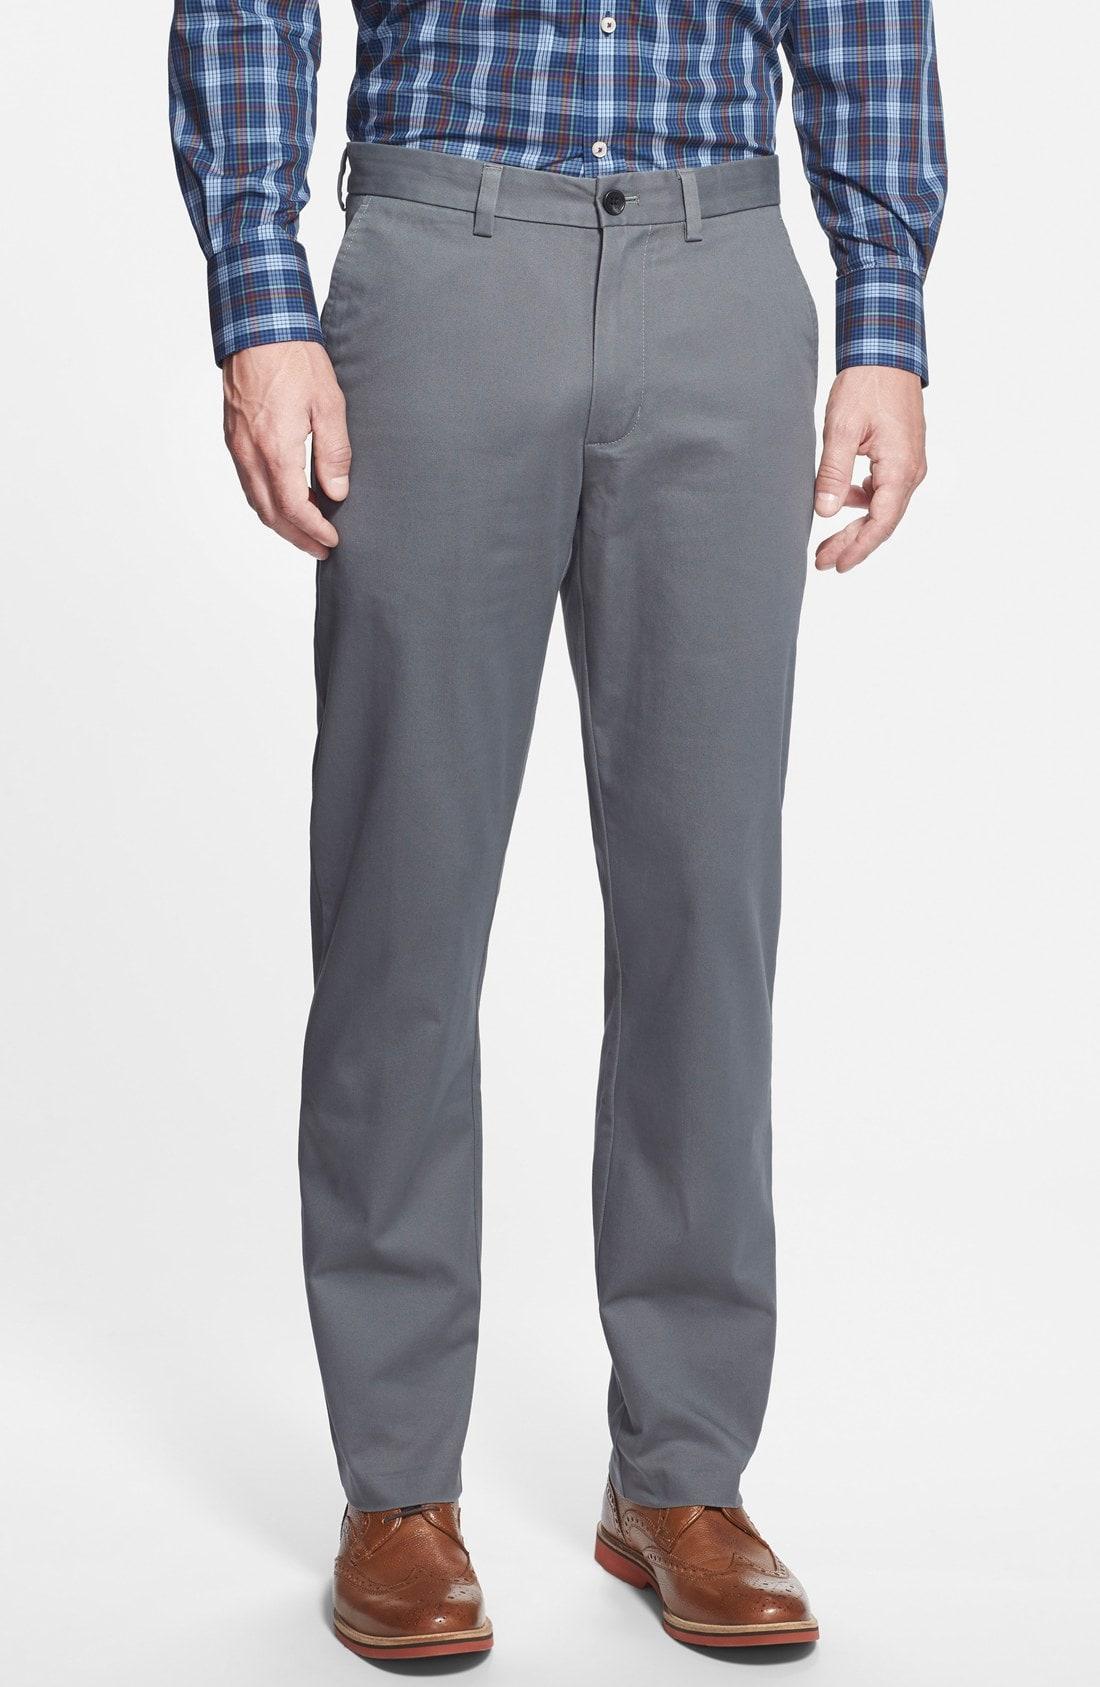 Nordstrom Men's Shop Wrinkle Free Straight Leg Chinos